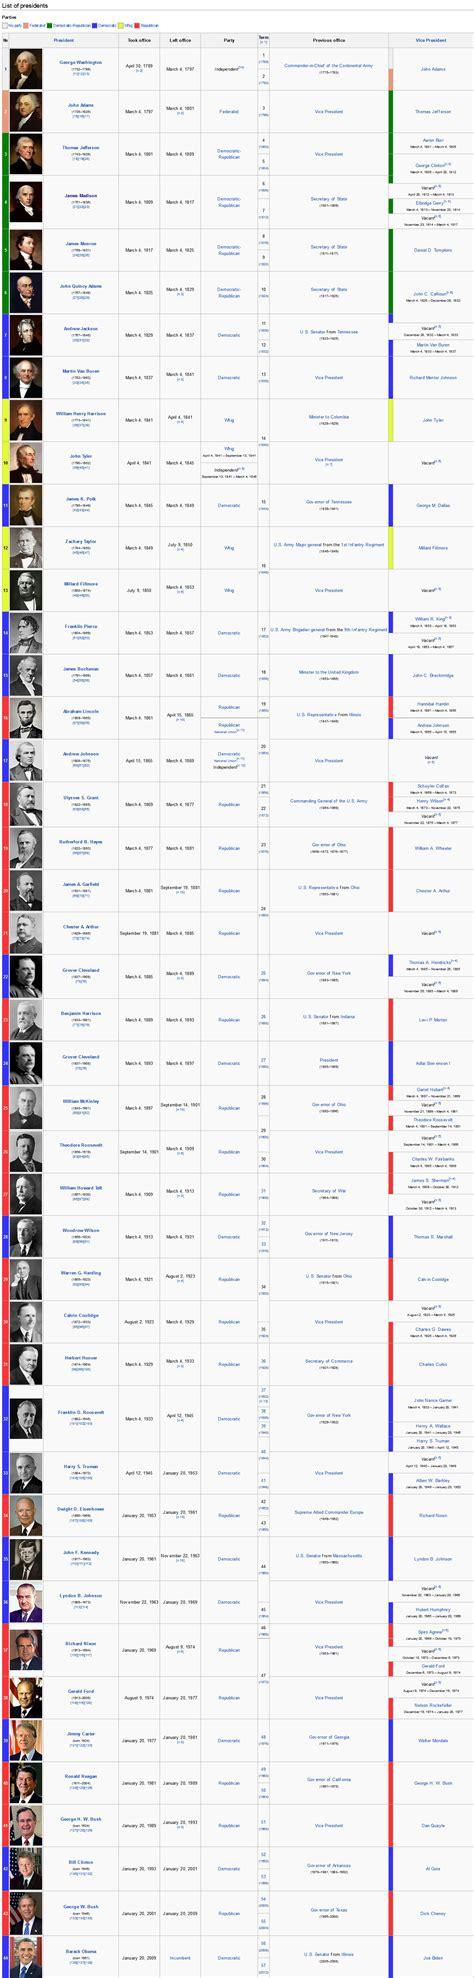 alain chabat wikipedia the free encyclopedia wikipedia the free encyclopedia en wikipedia org wiki